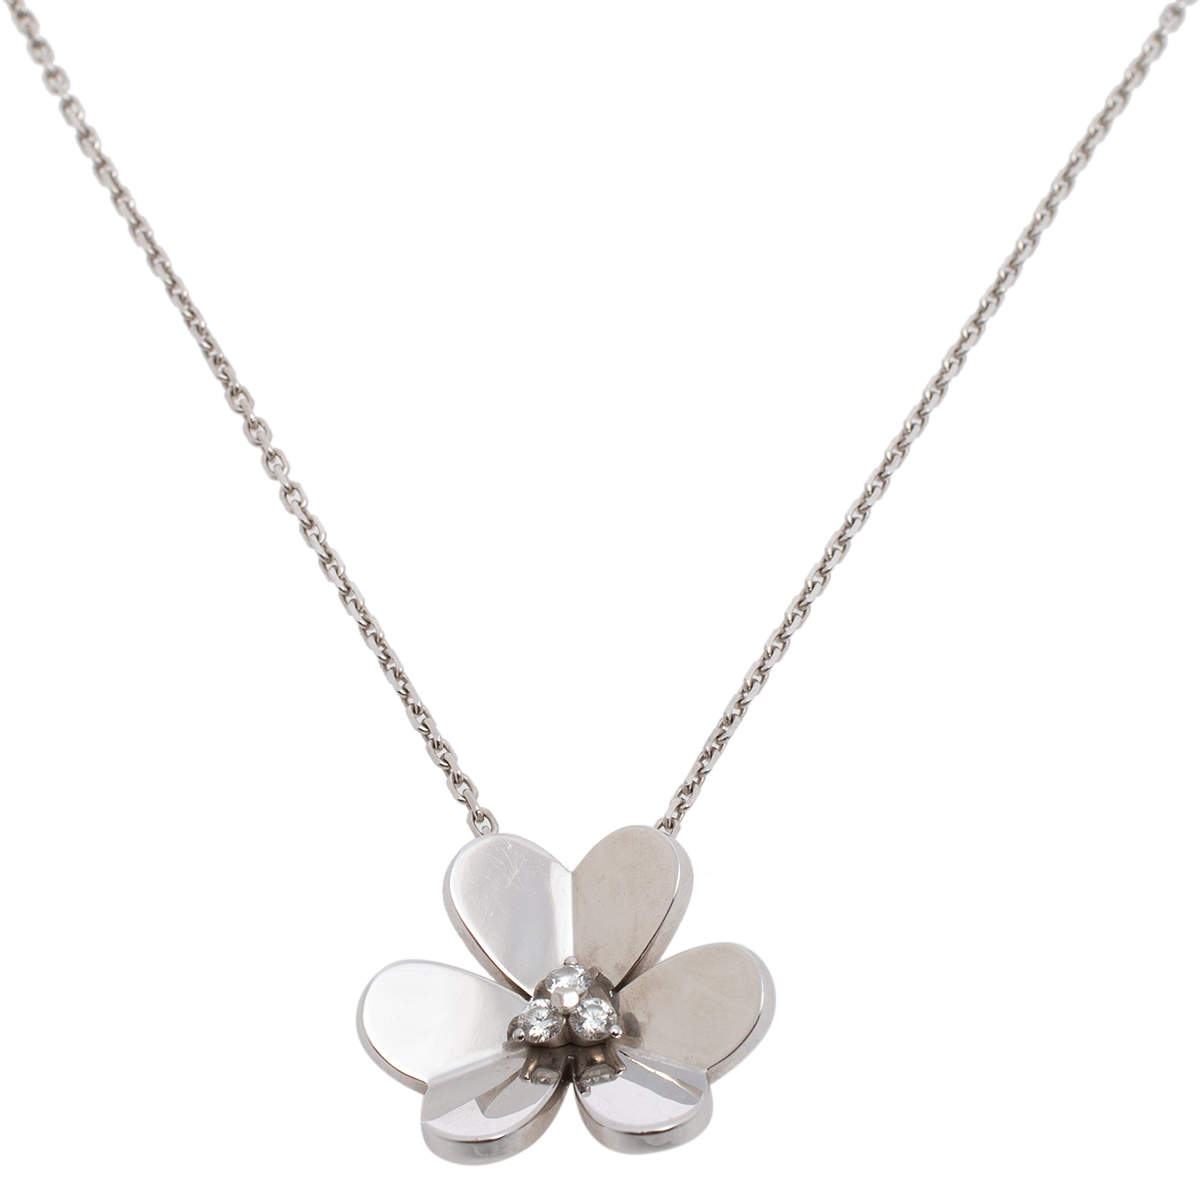 Van Cleef & Arpels Frivole Diamond 18K White Gold Large Pendant Necklace